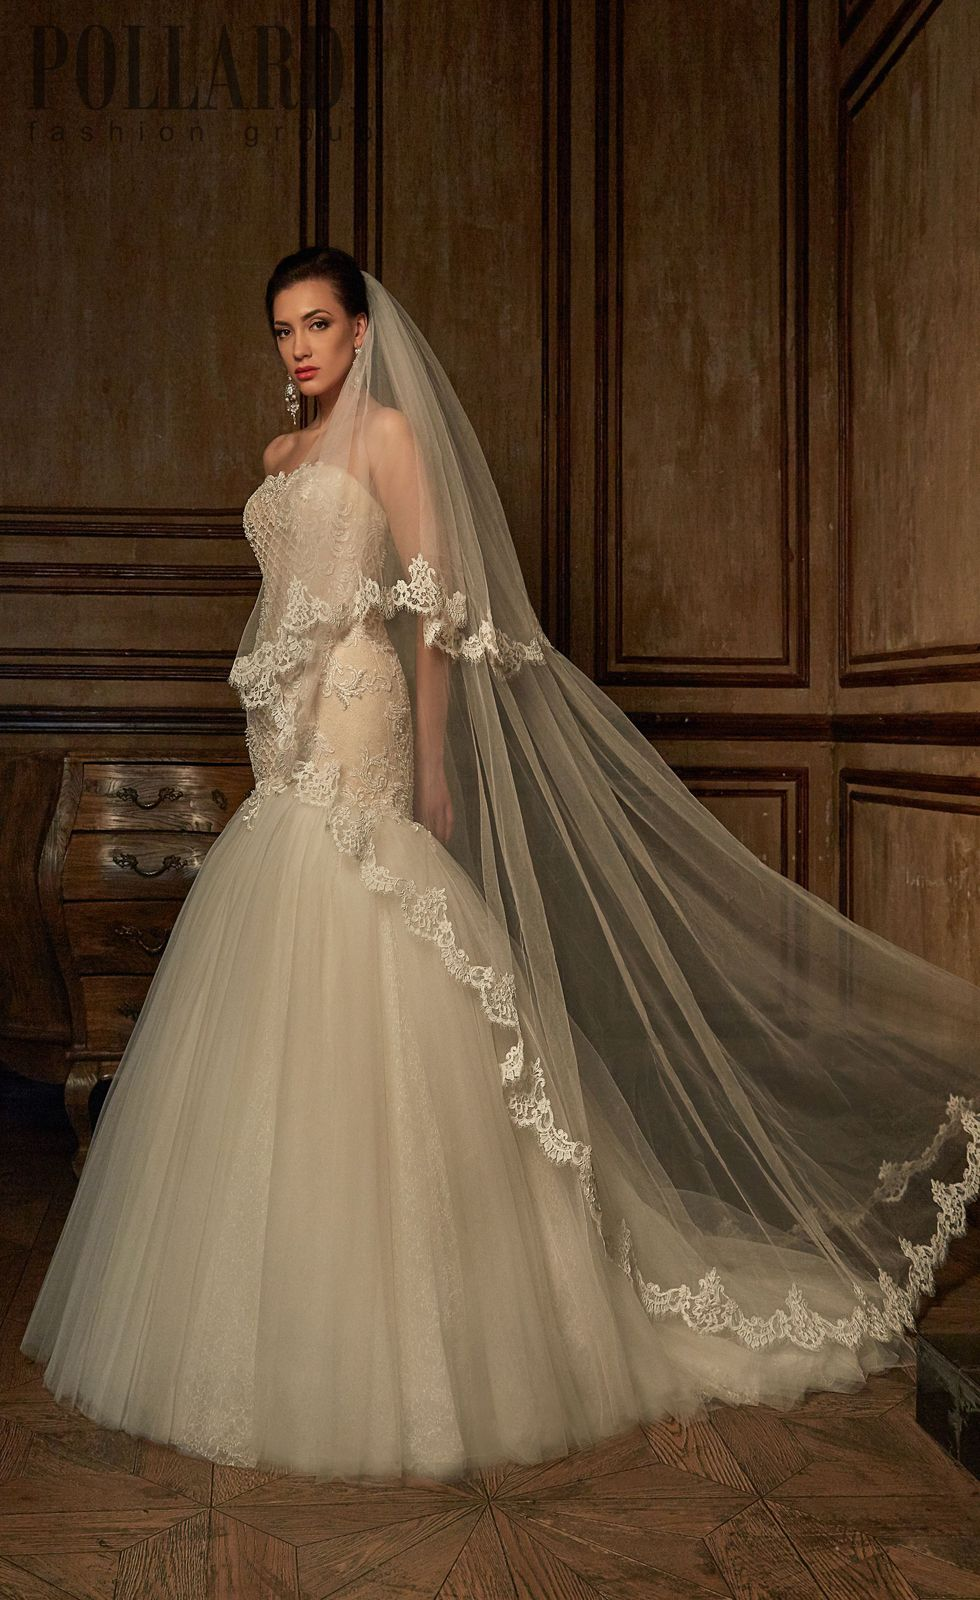 Brown wedding dresses  PL  Casadeya g  Wedding dresses  Pinterest  Wedding